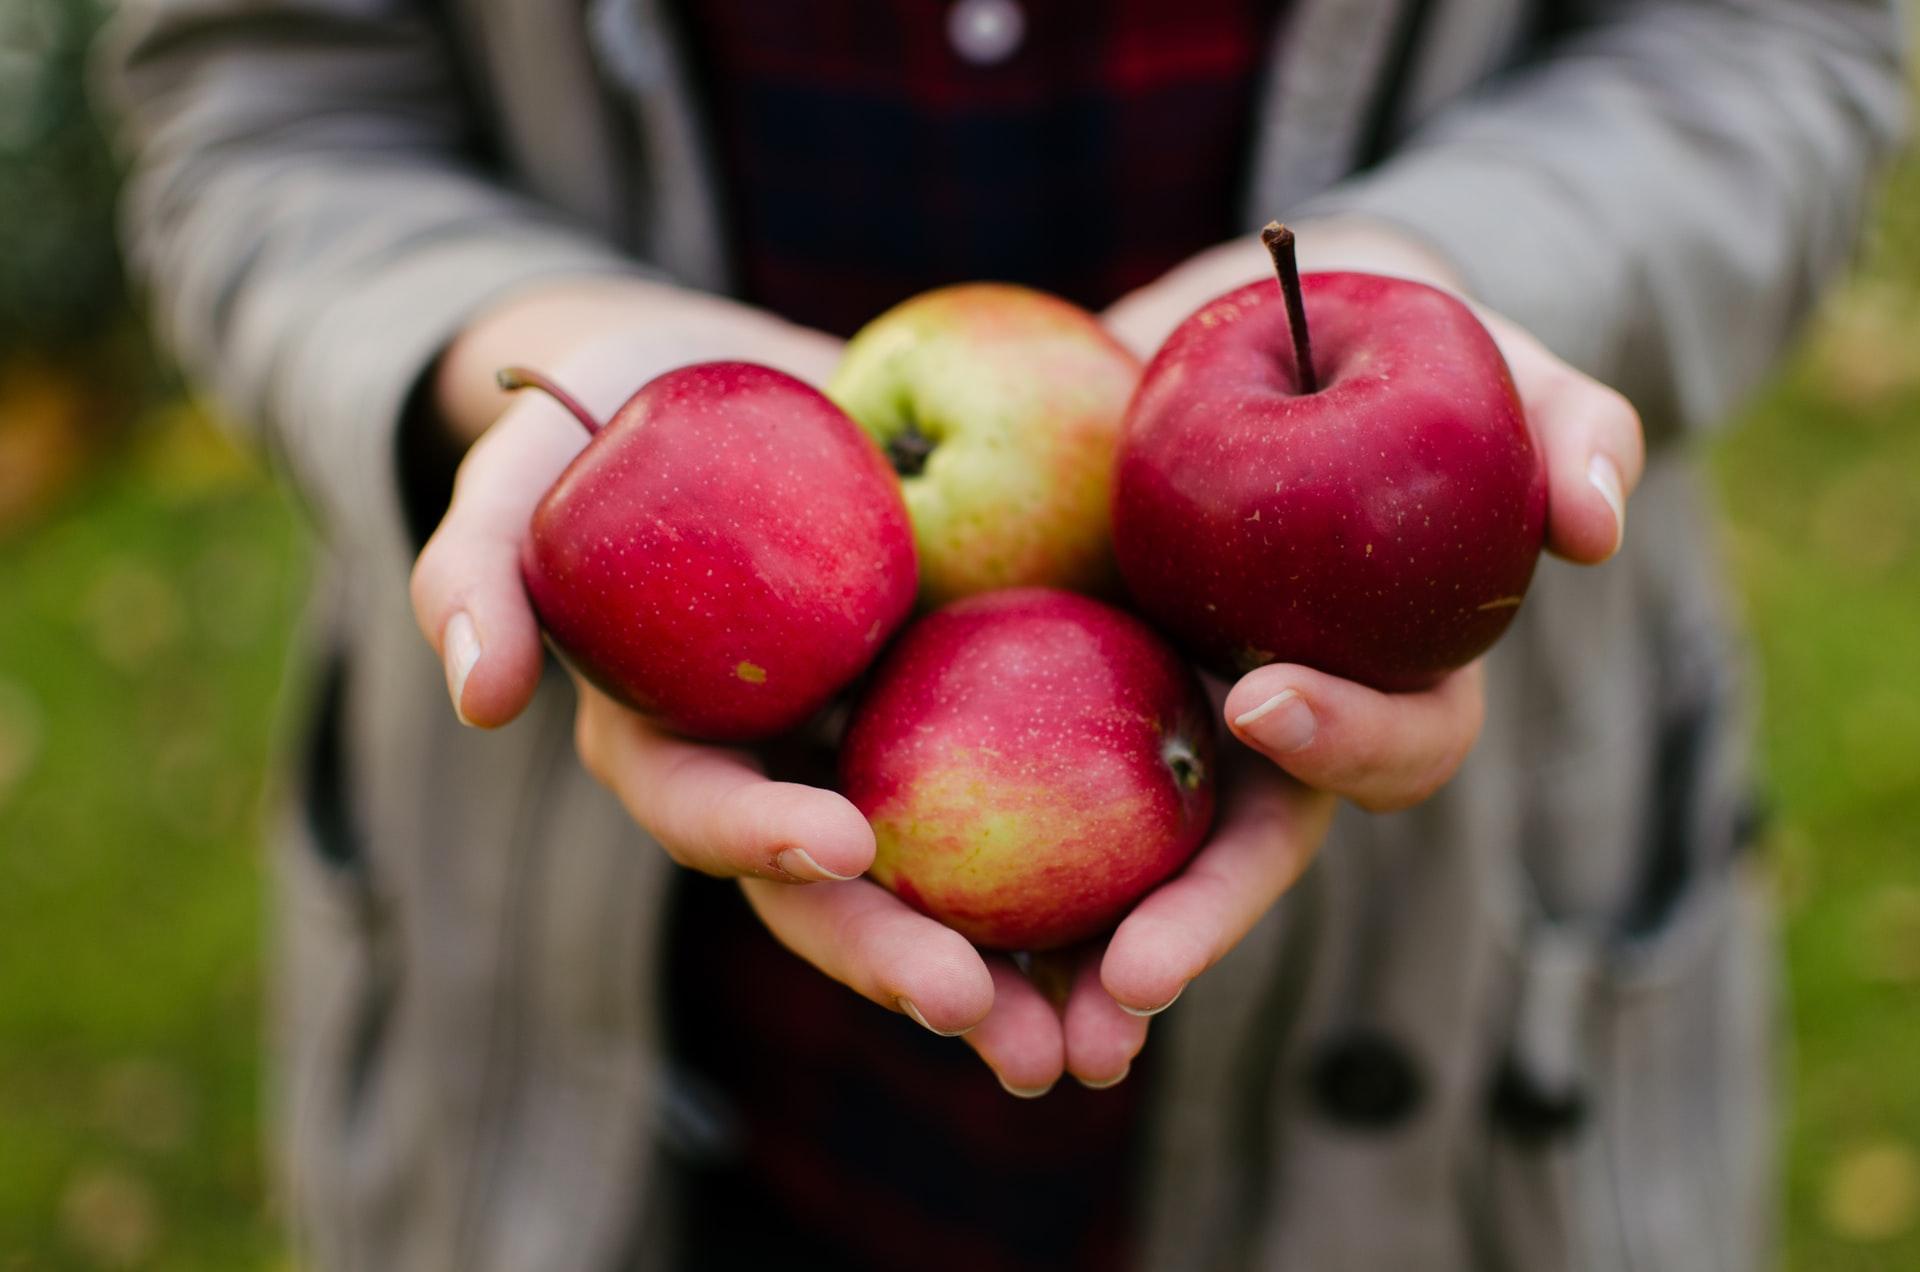 Frau hält vier Äpfel in den Händen, Foto: Aarón Blanco Tejedor, Unsplash